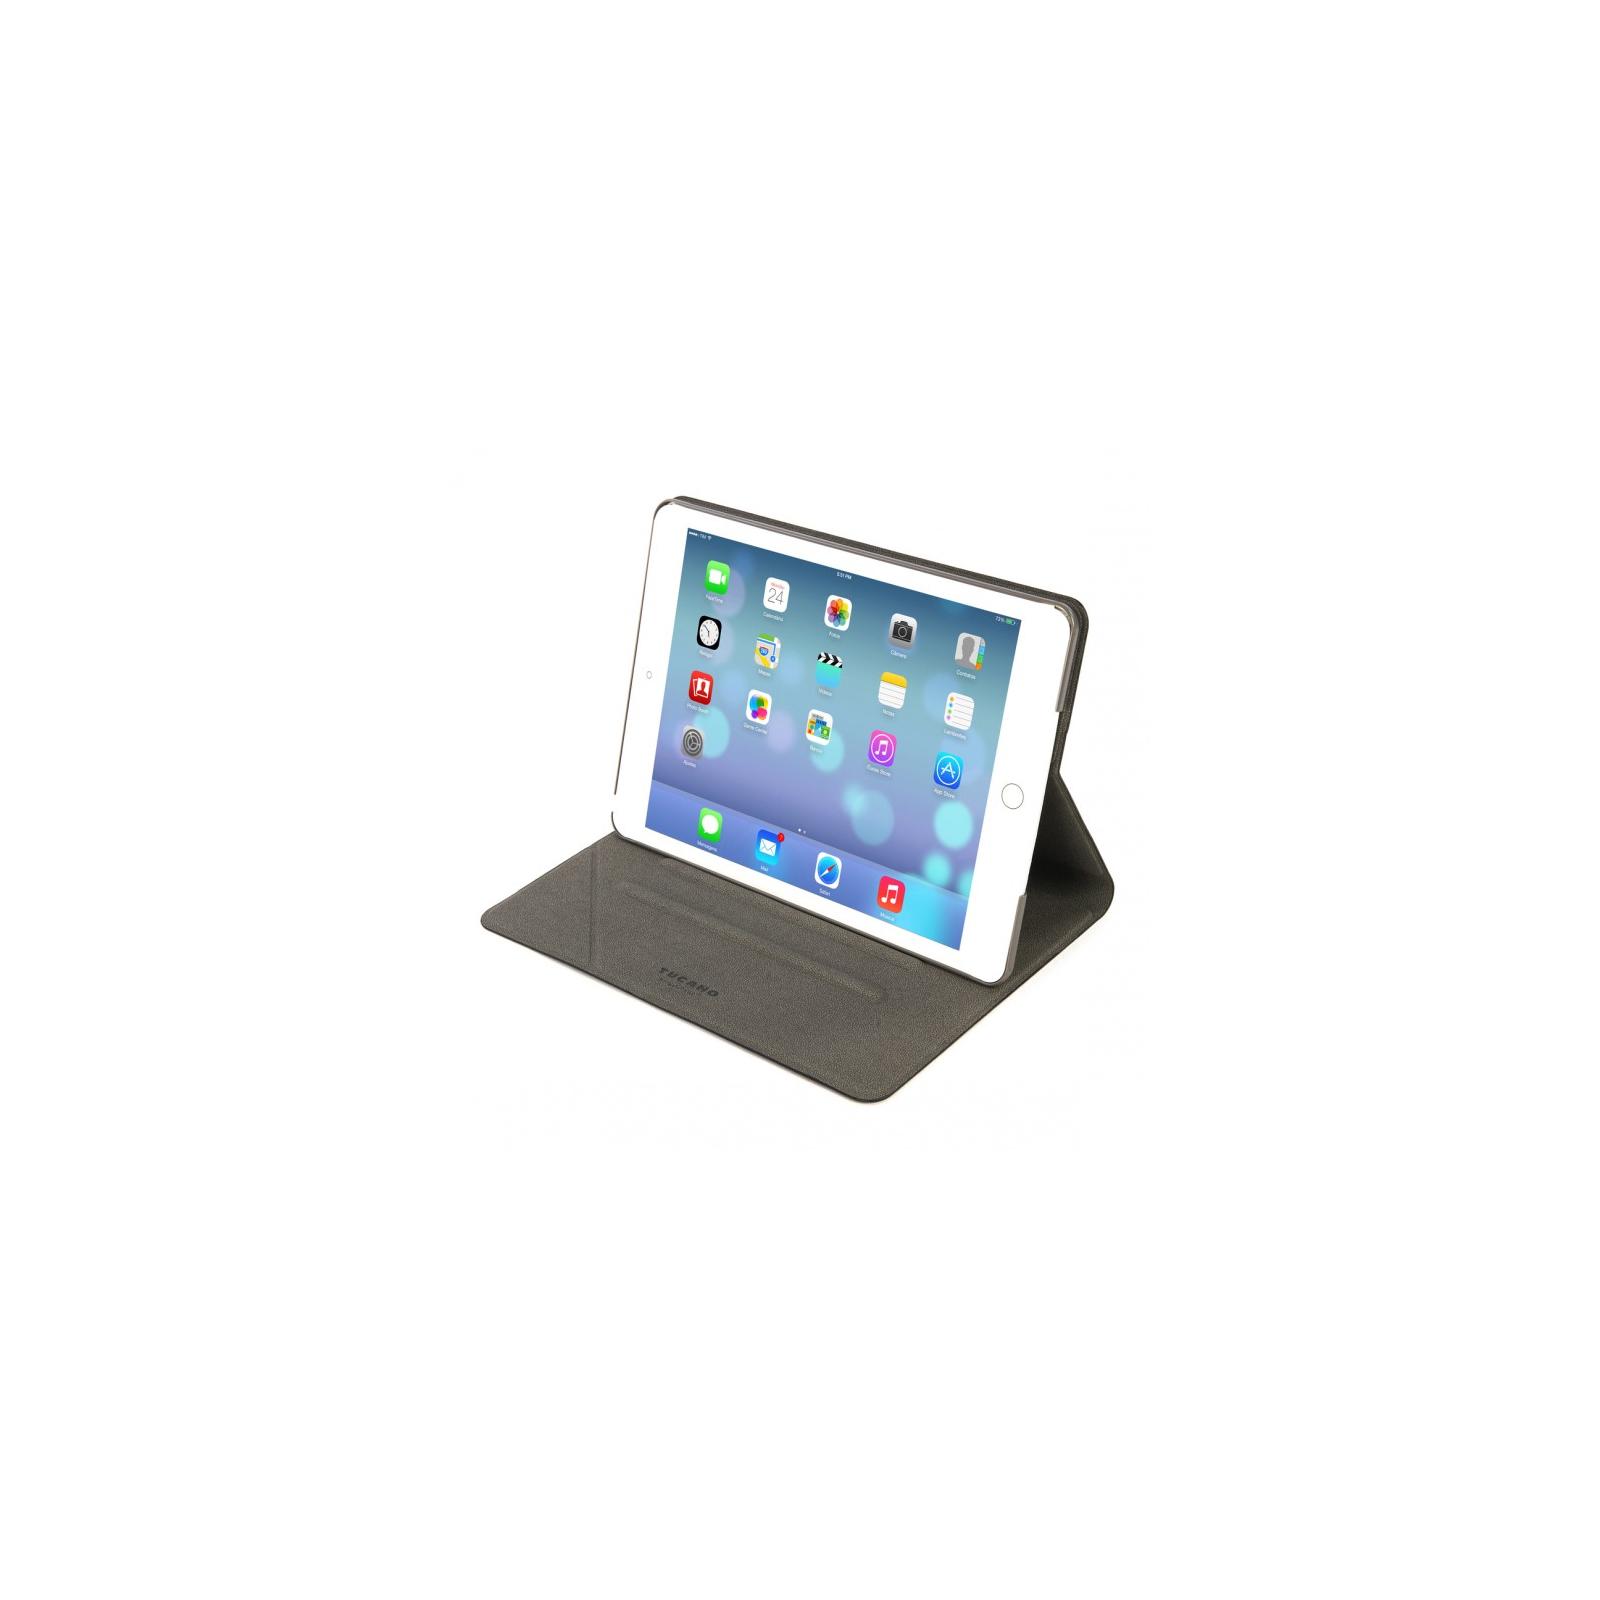 Чехол для планшета Tucano iPad Air Angolo Black (IPD5AN) изображение 3